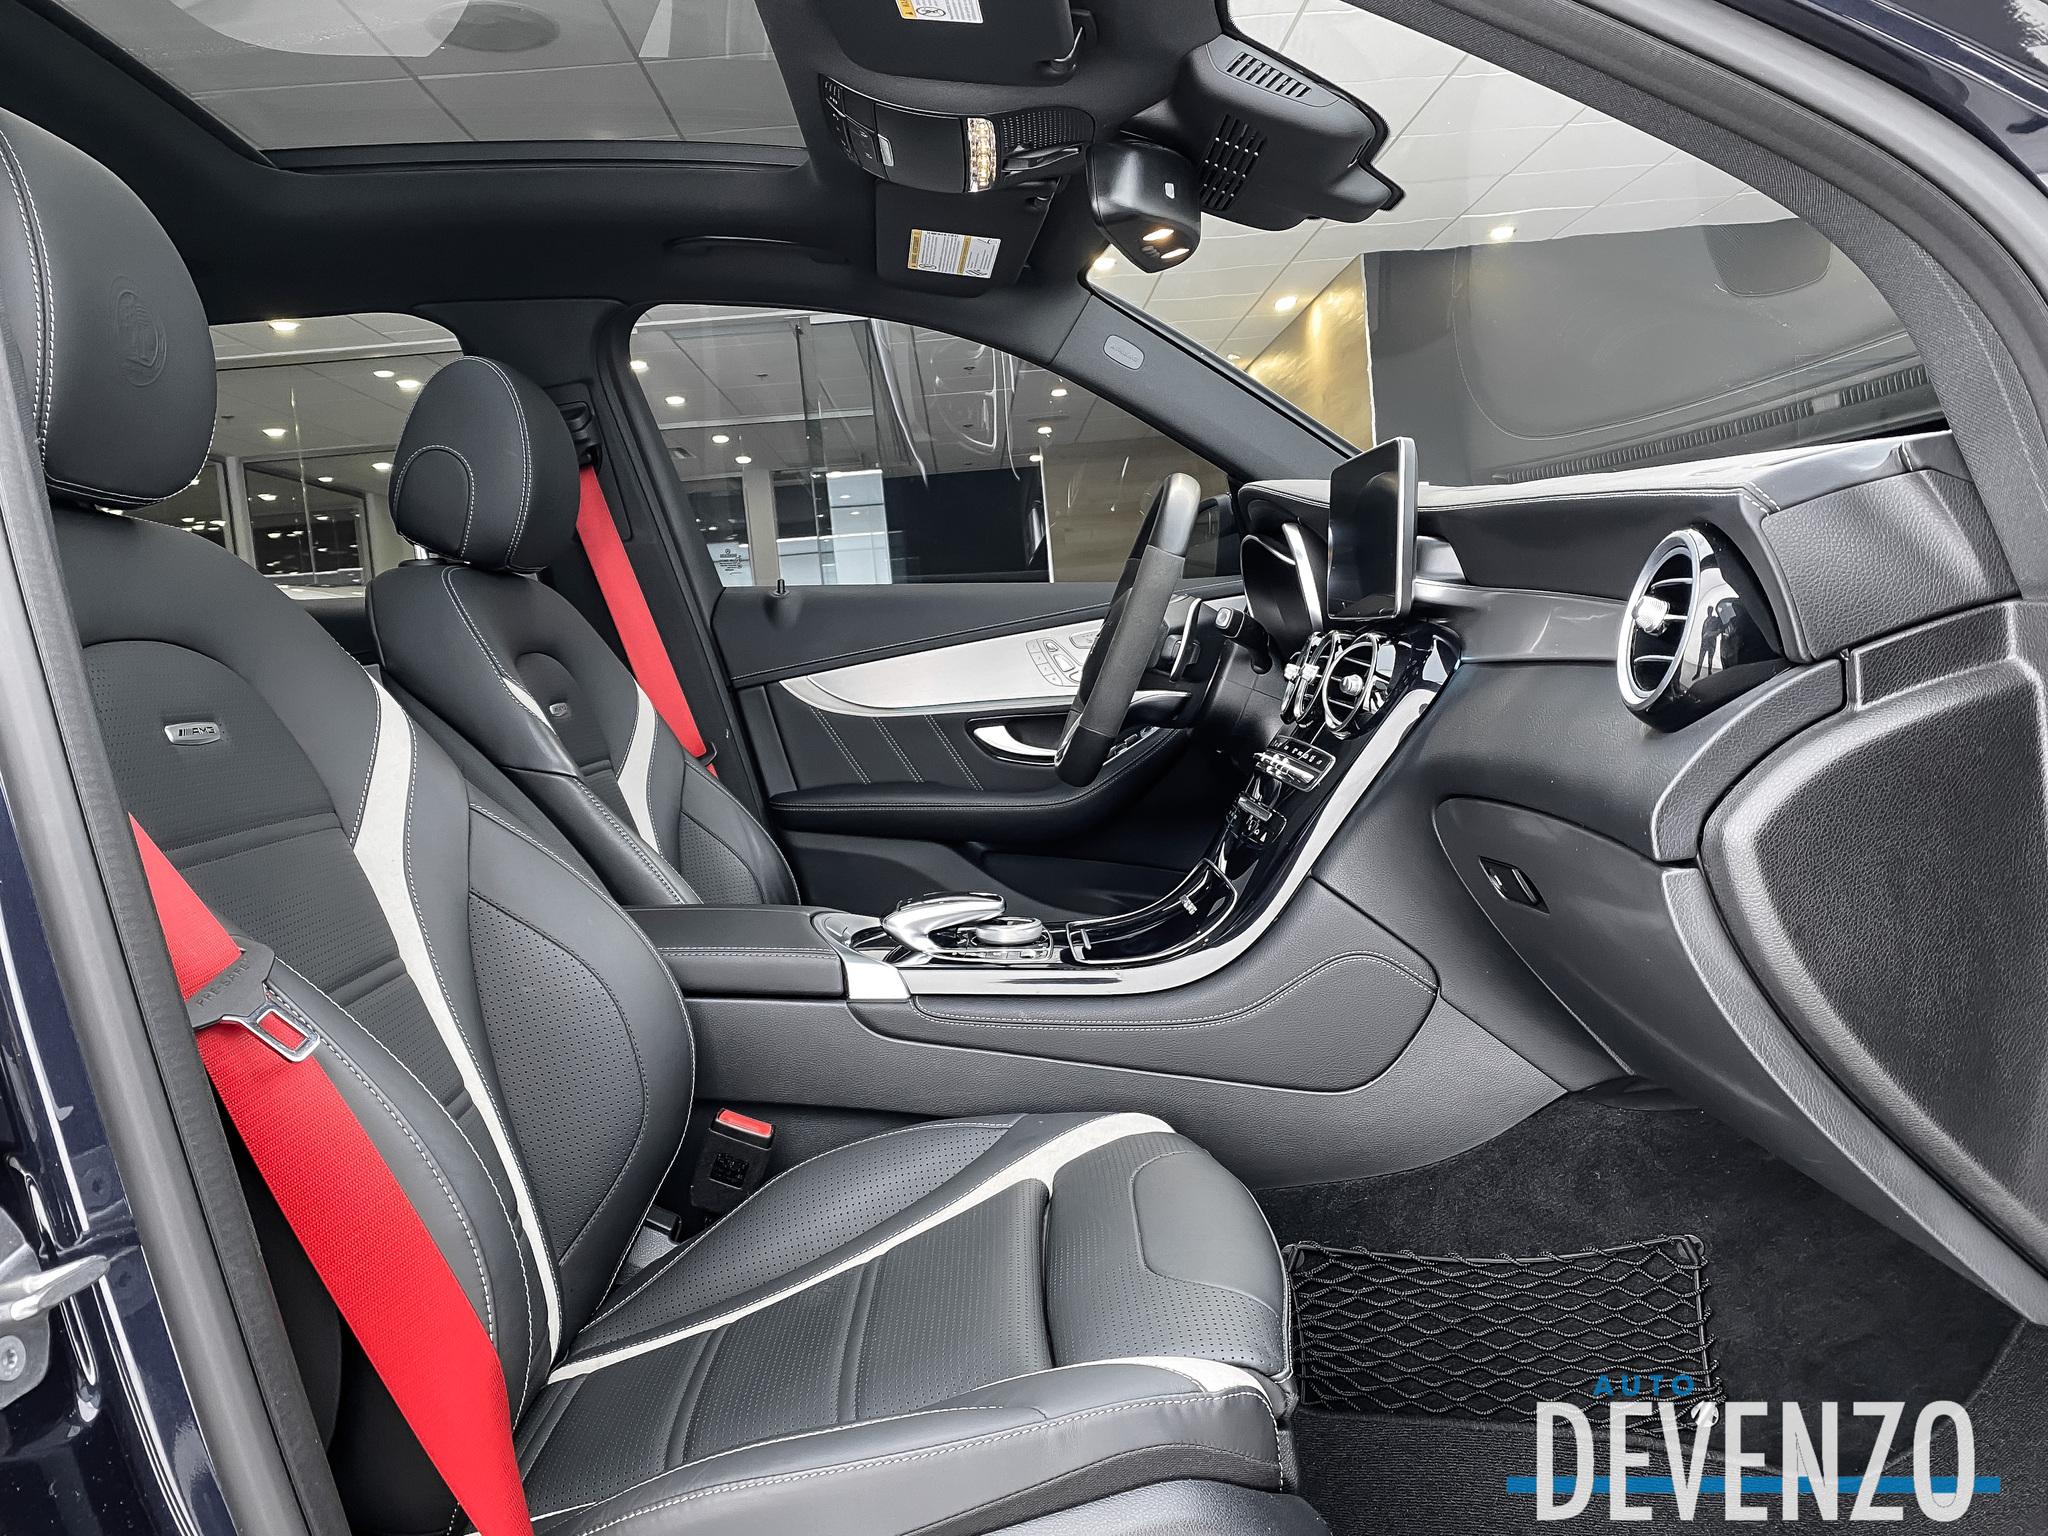 2019 Mercedes-Benz GLC AMG GLC63 S 4MATIC+ V8 BITURBO 503HP complet